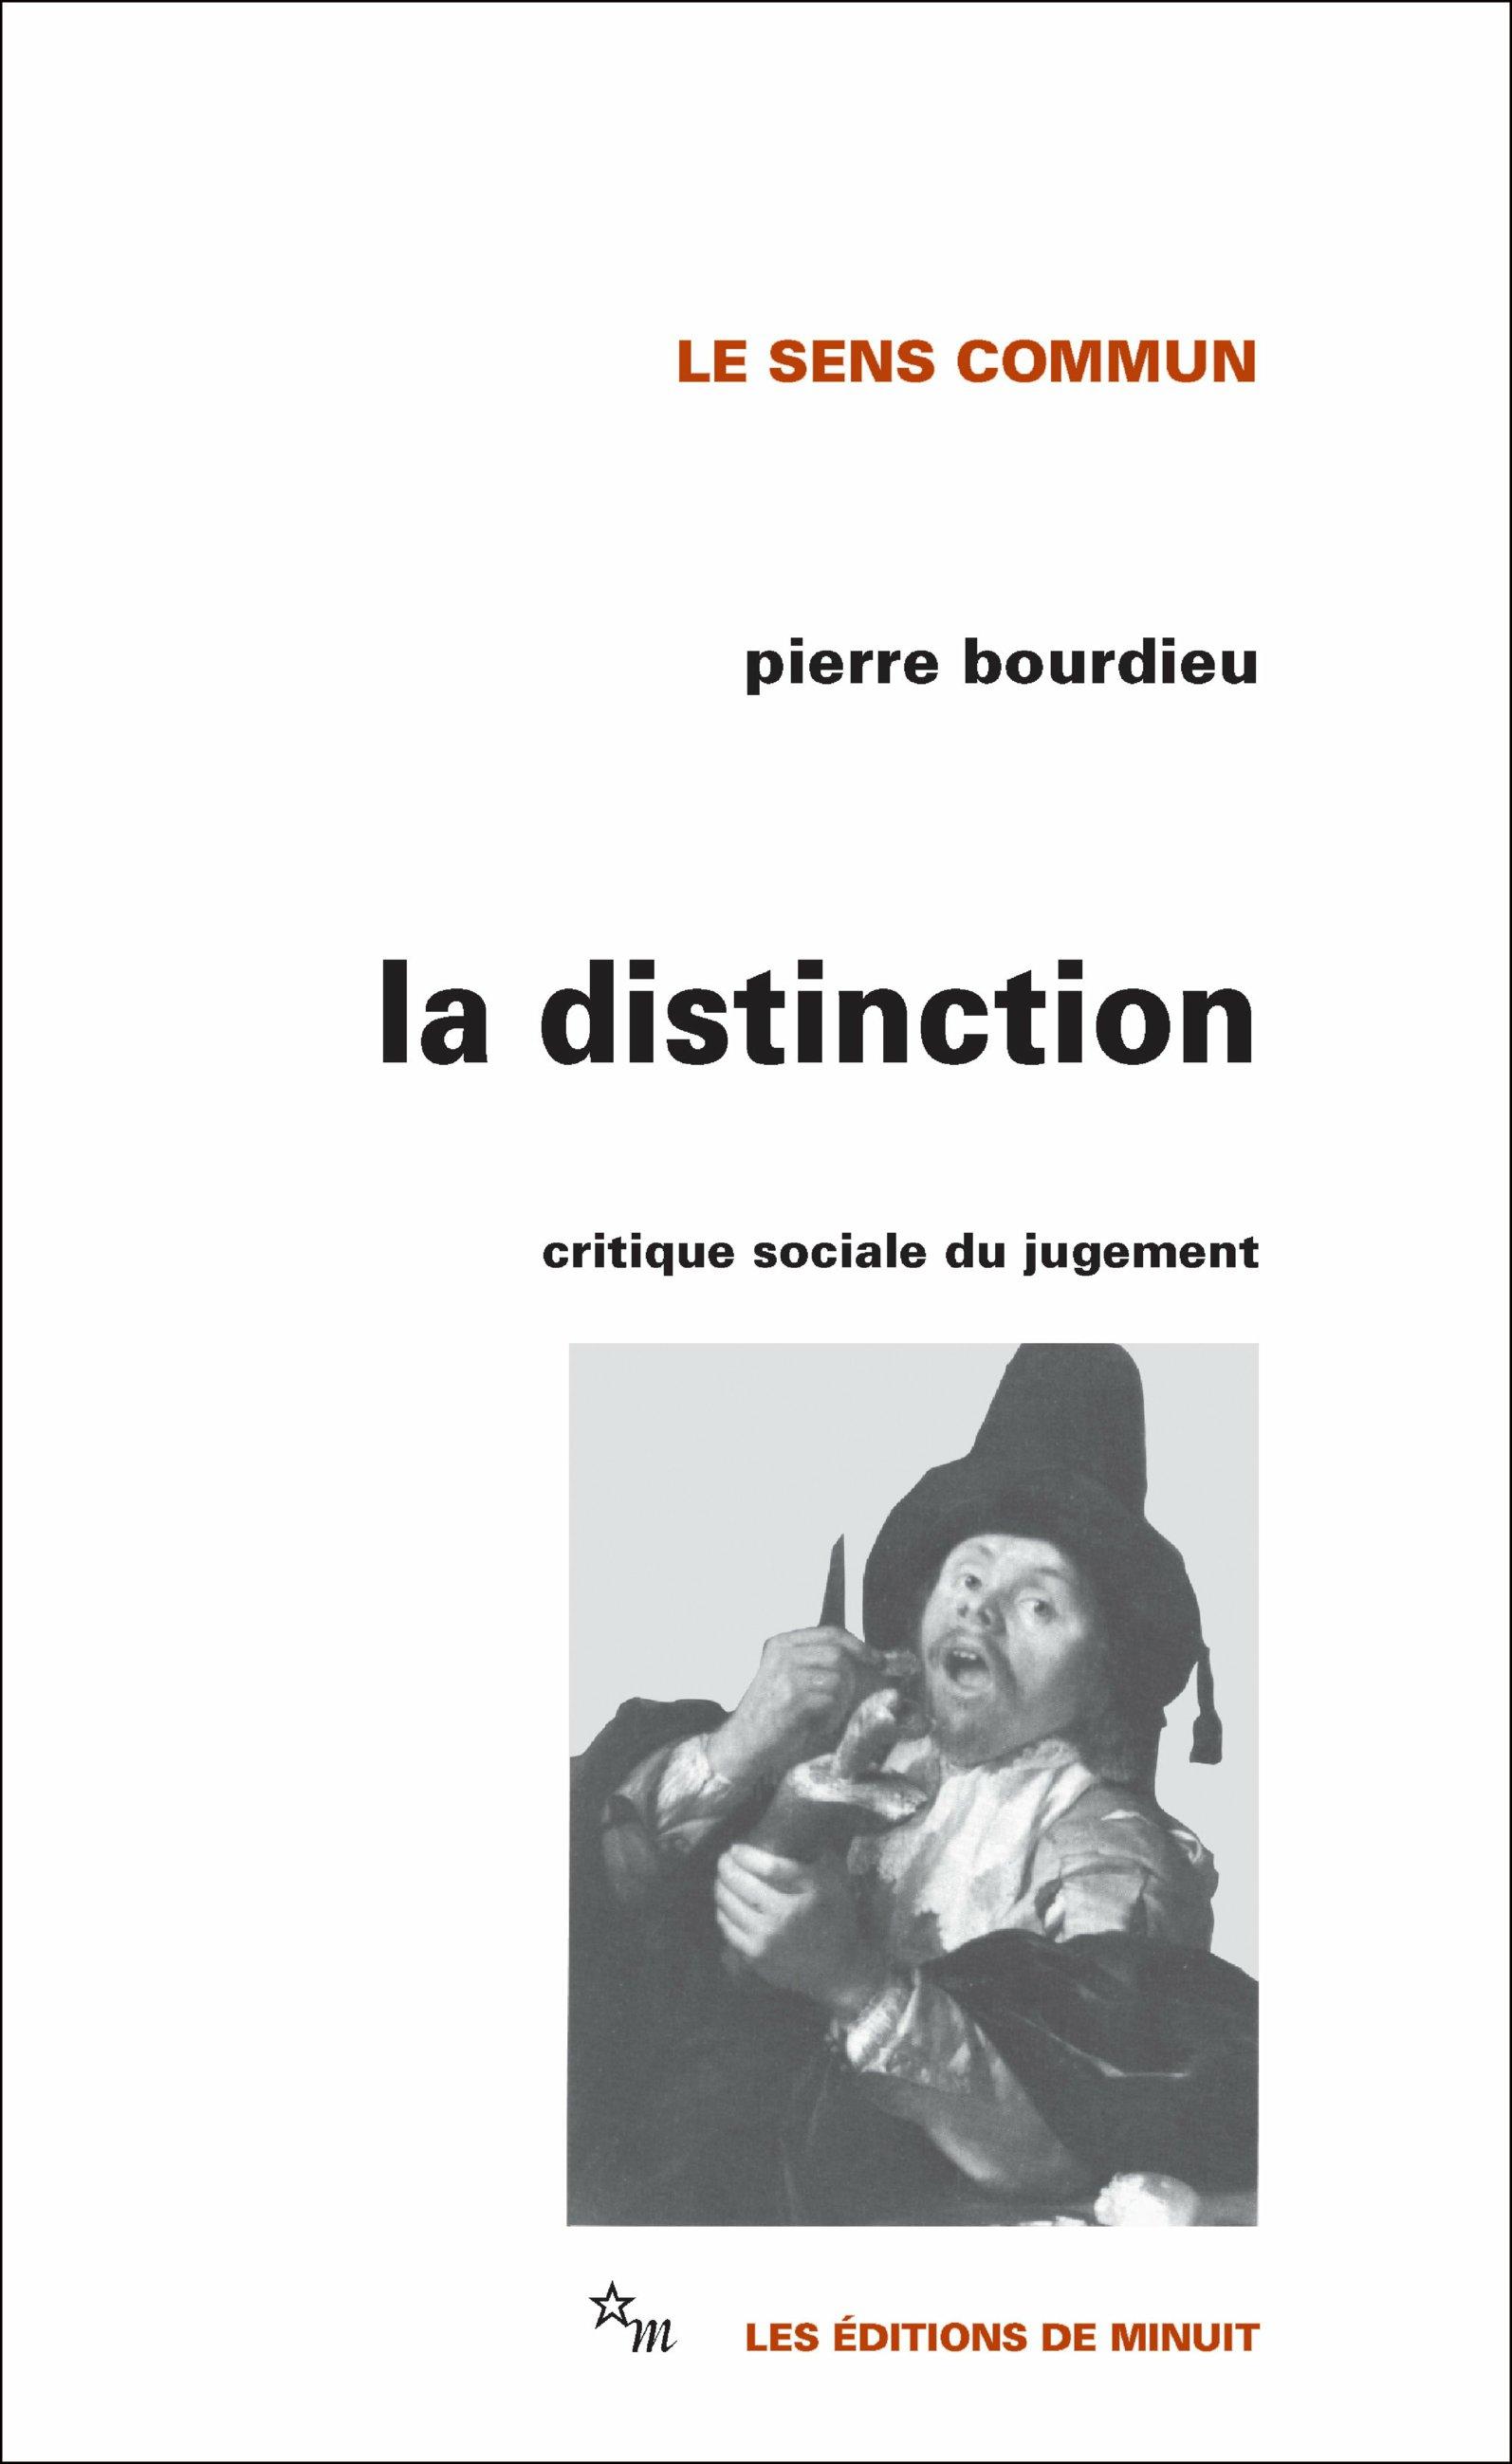 pierre bourdieu 1979 classes and classifications